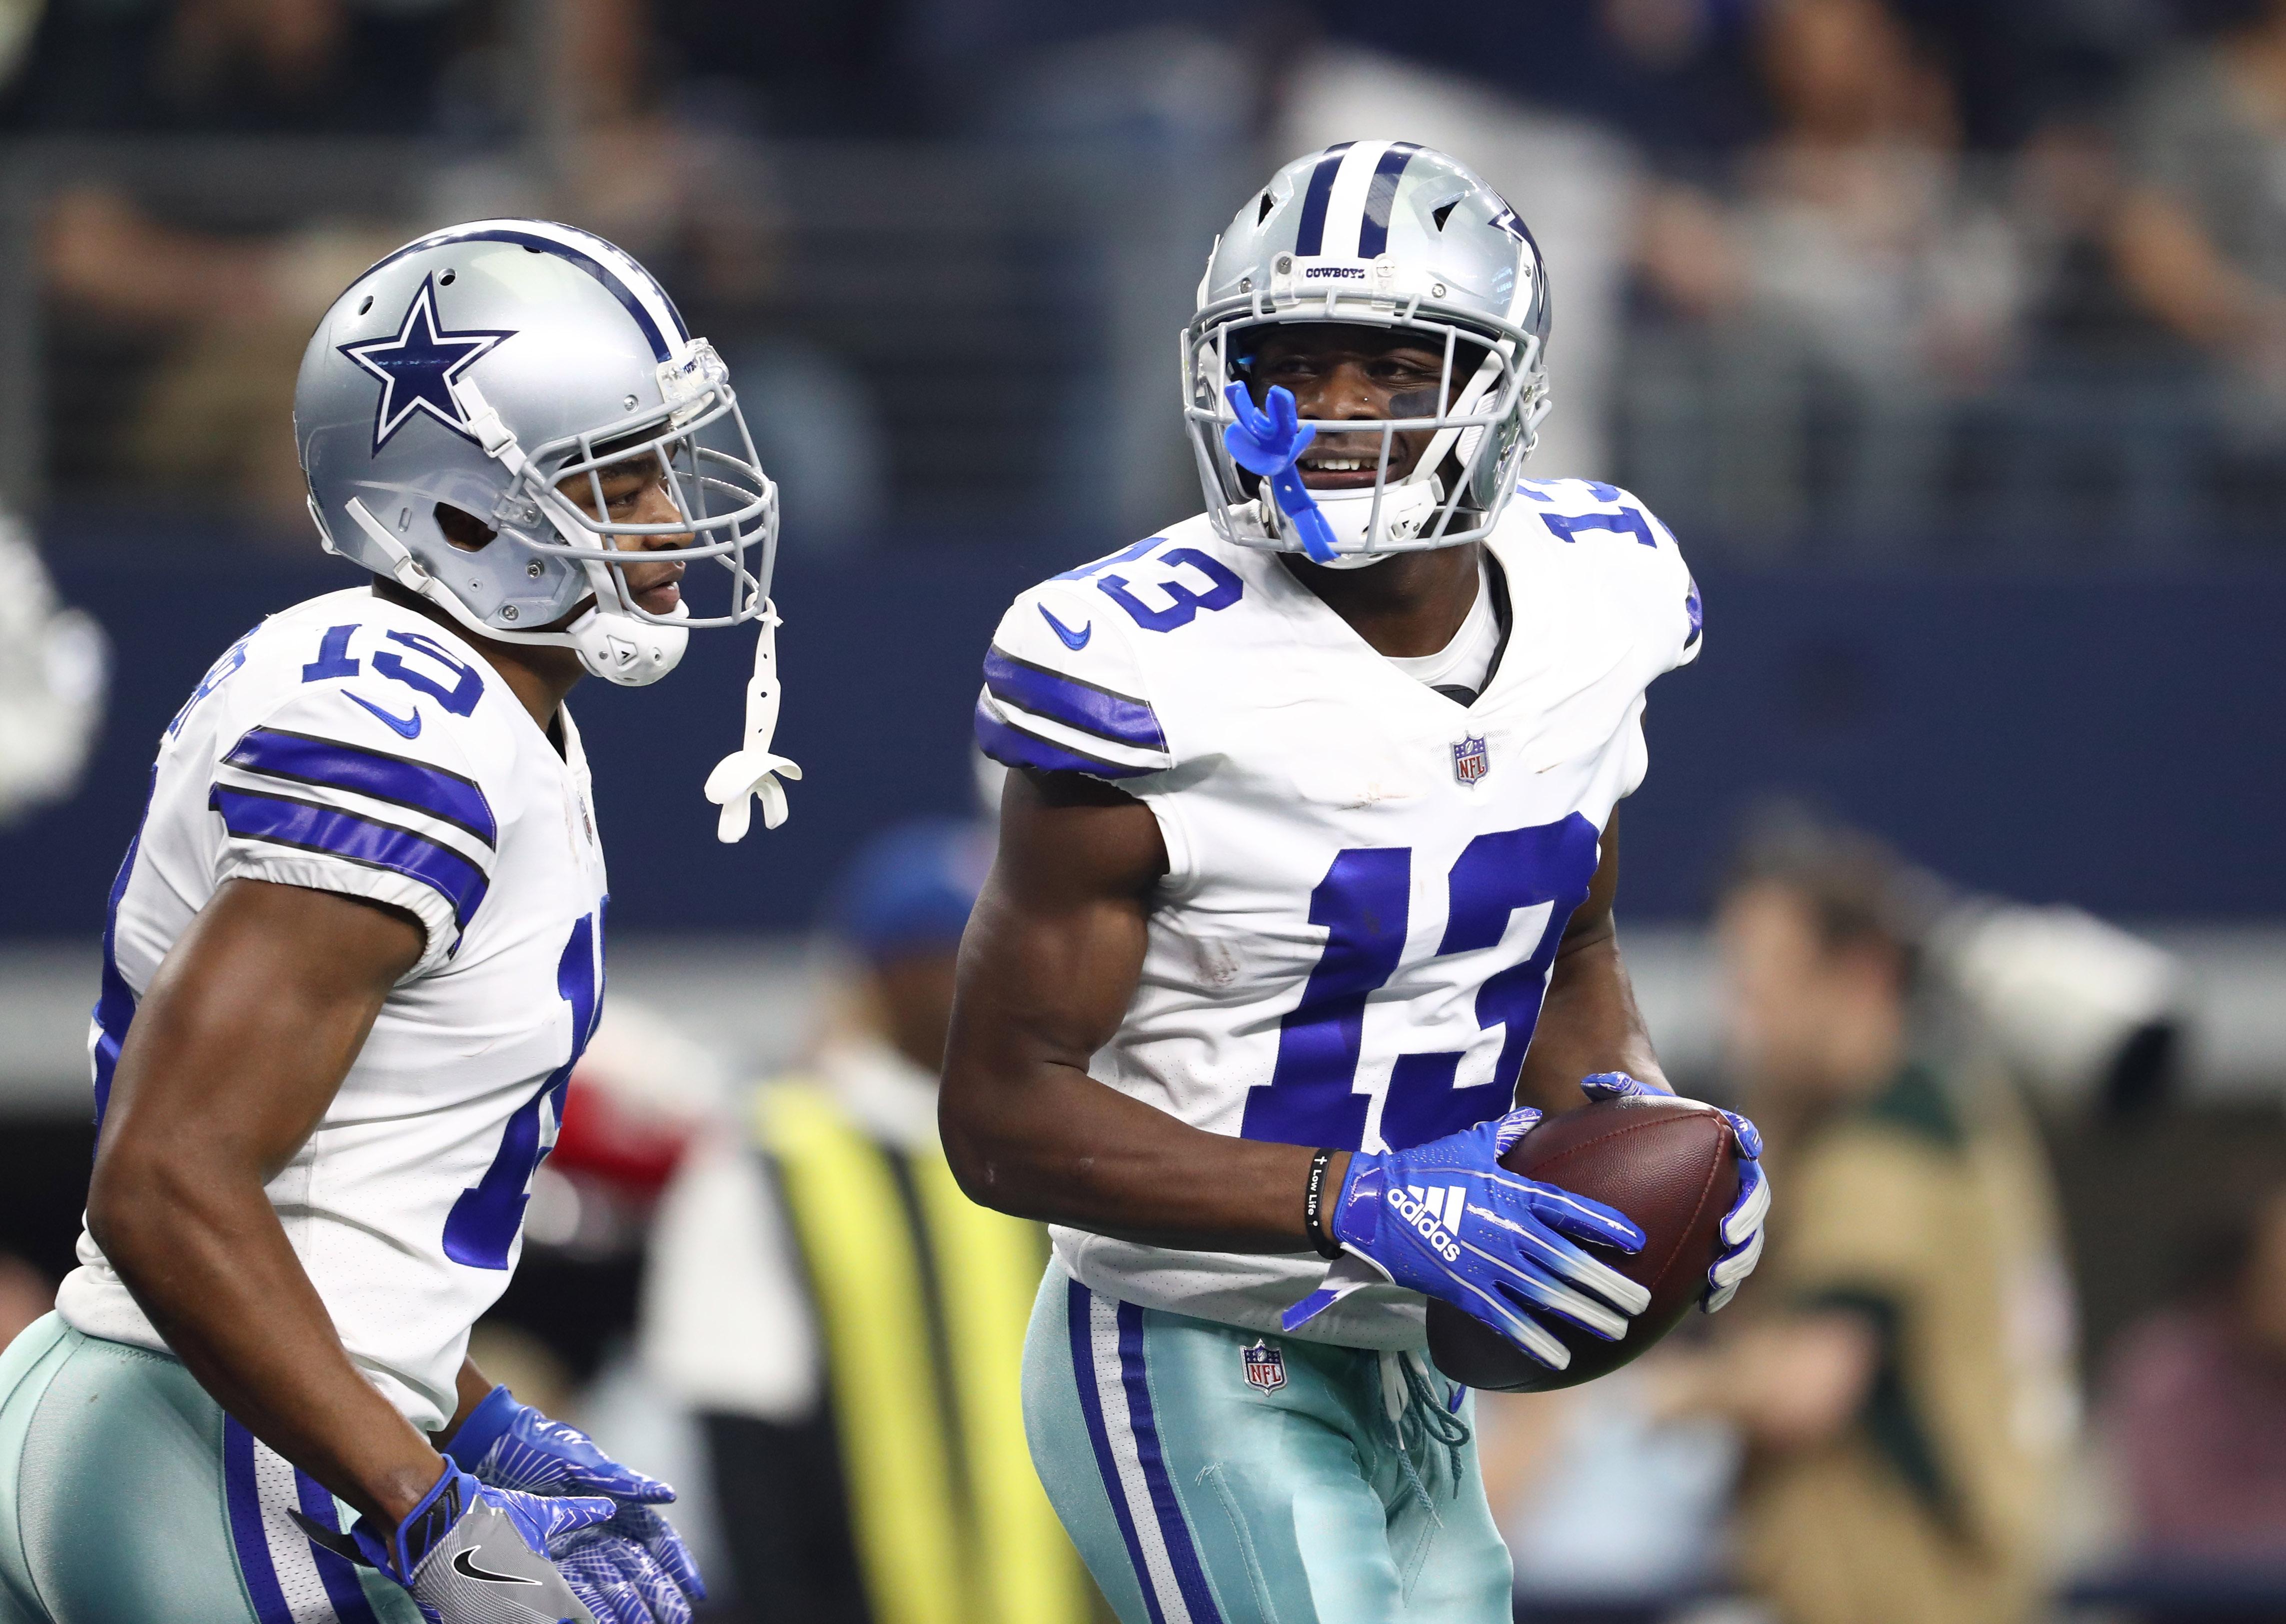 NFL: Tampa Bay Buccaneers at Dallas Cowboys